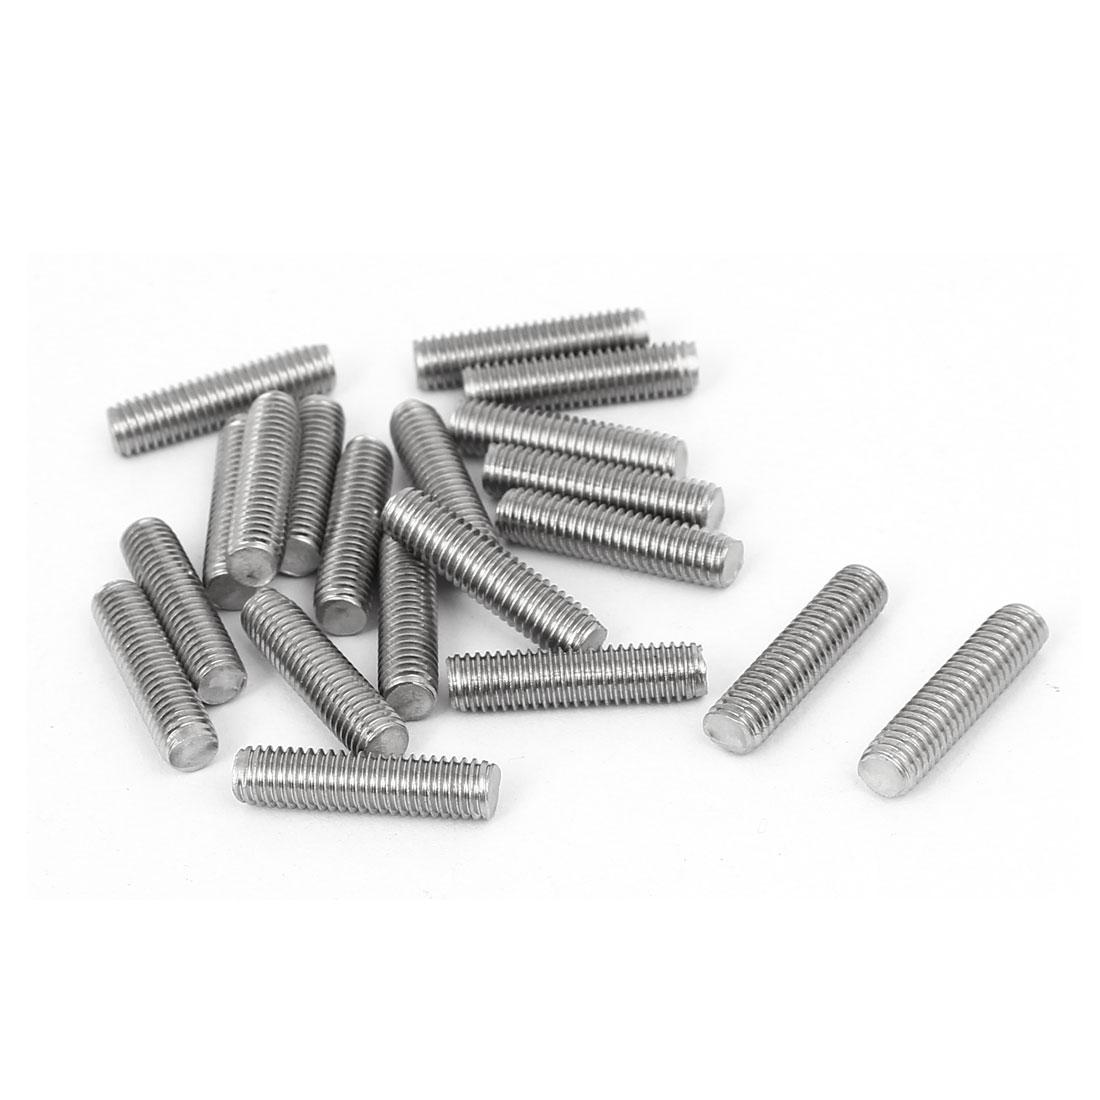 M5 x 20mm 304 Stainless Steel Fully Threaded Rod Bar Studs Fastener 20 Pcs